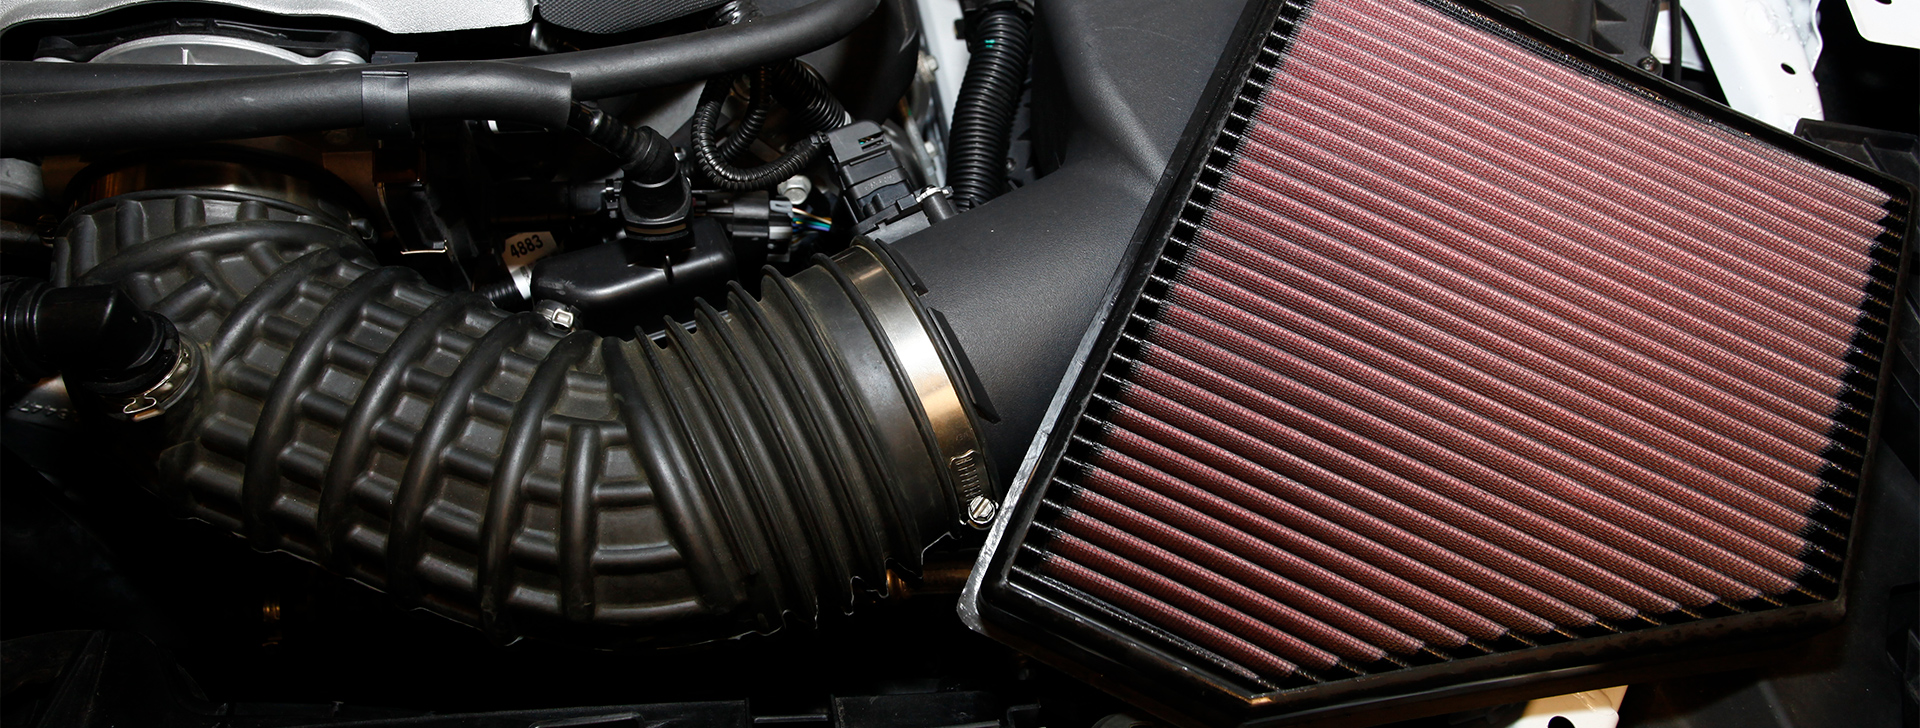 filter on engine